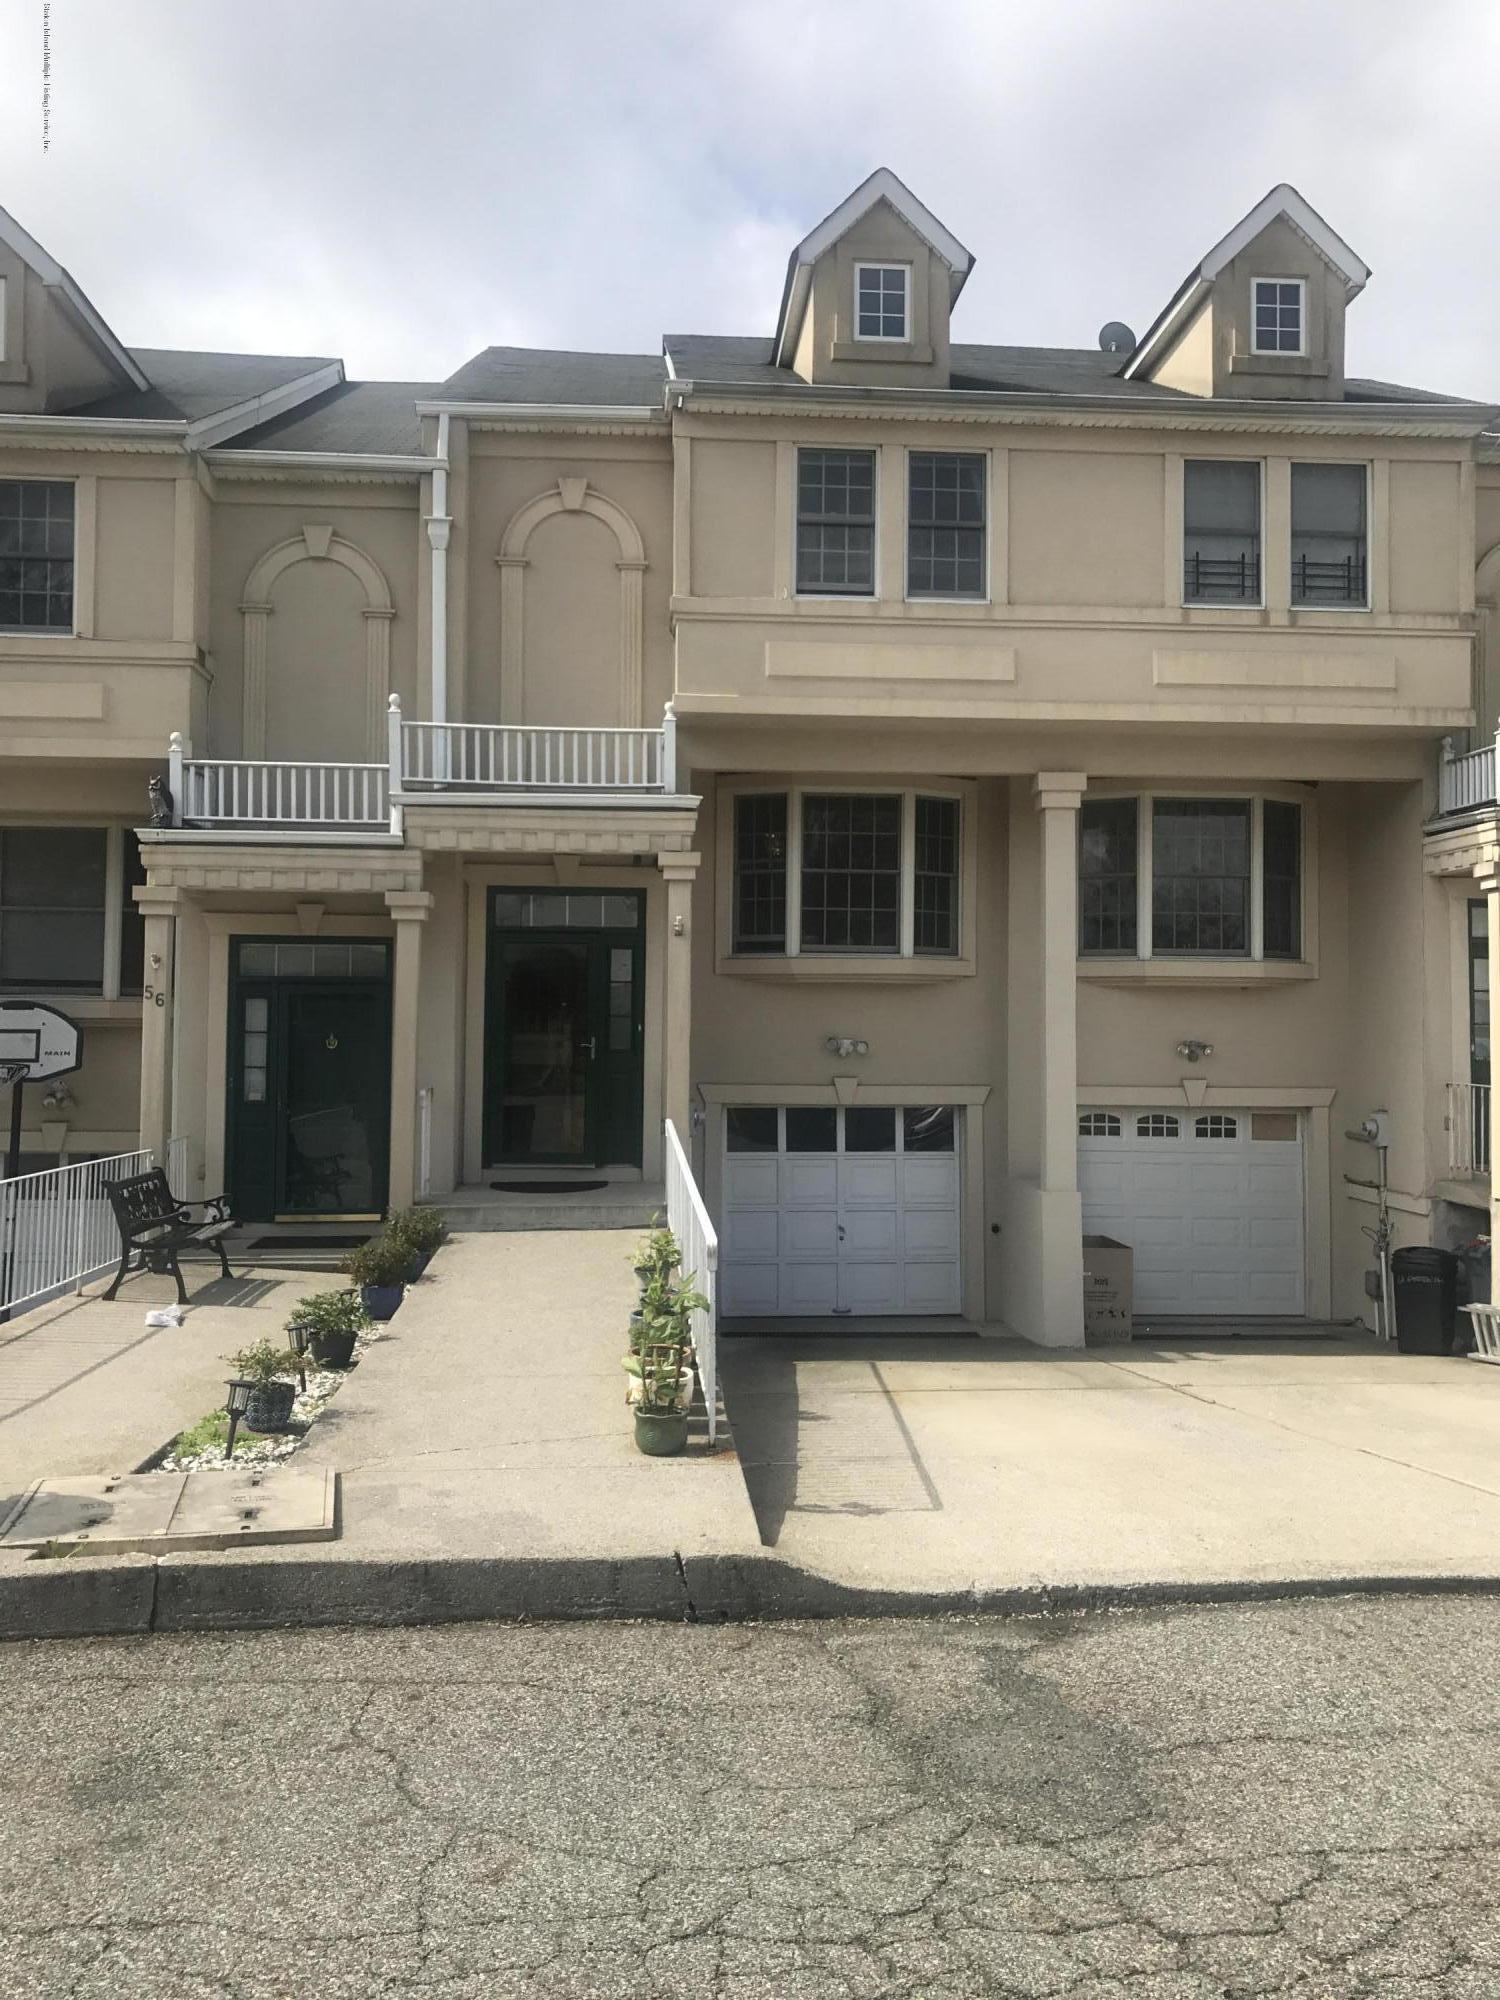 Single Family - Attached in Grasmere - 58 Garretson Lane  Staten Island, NY 10304